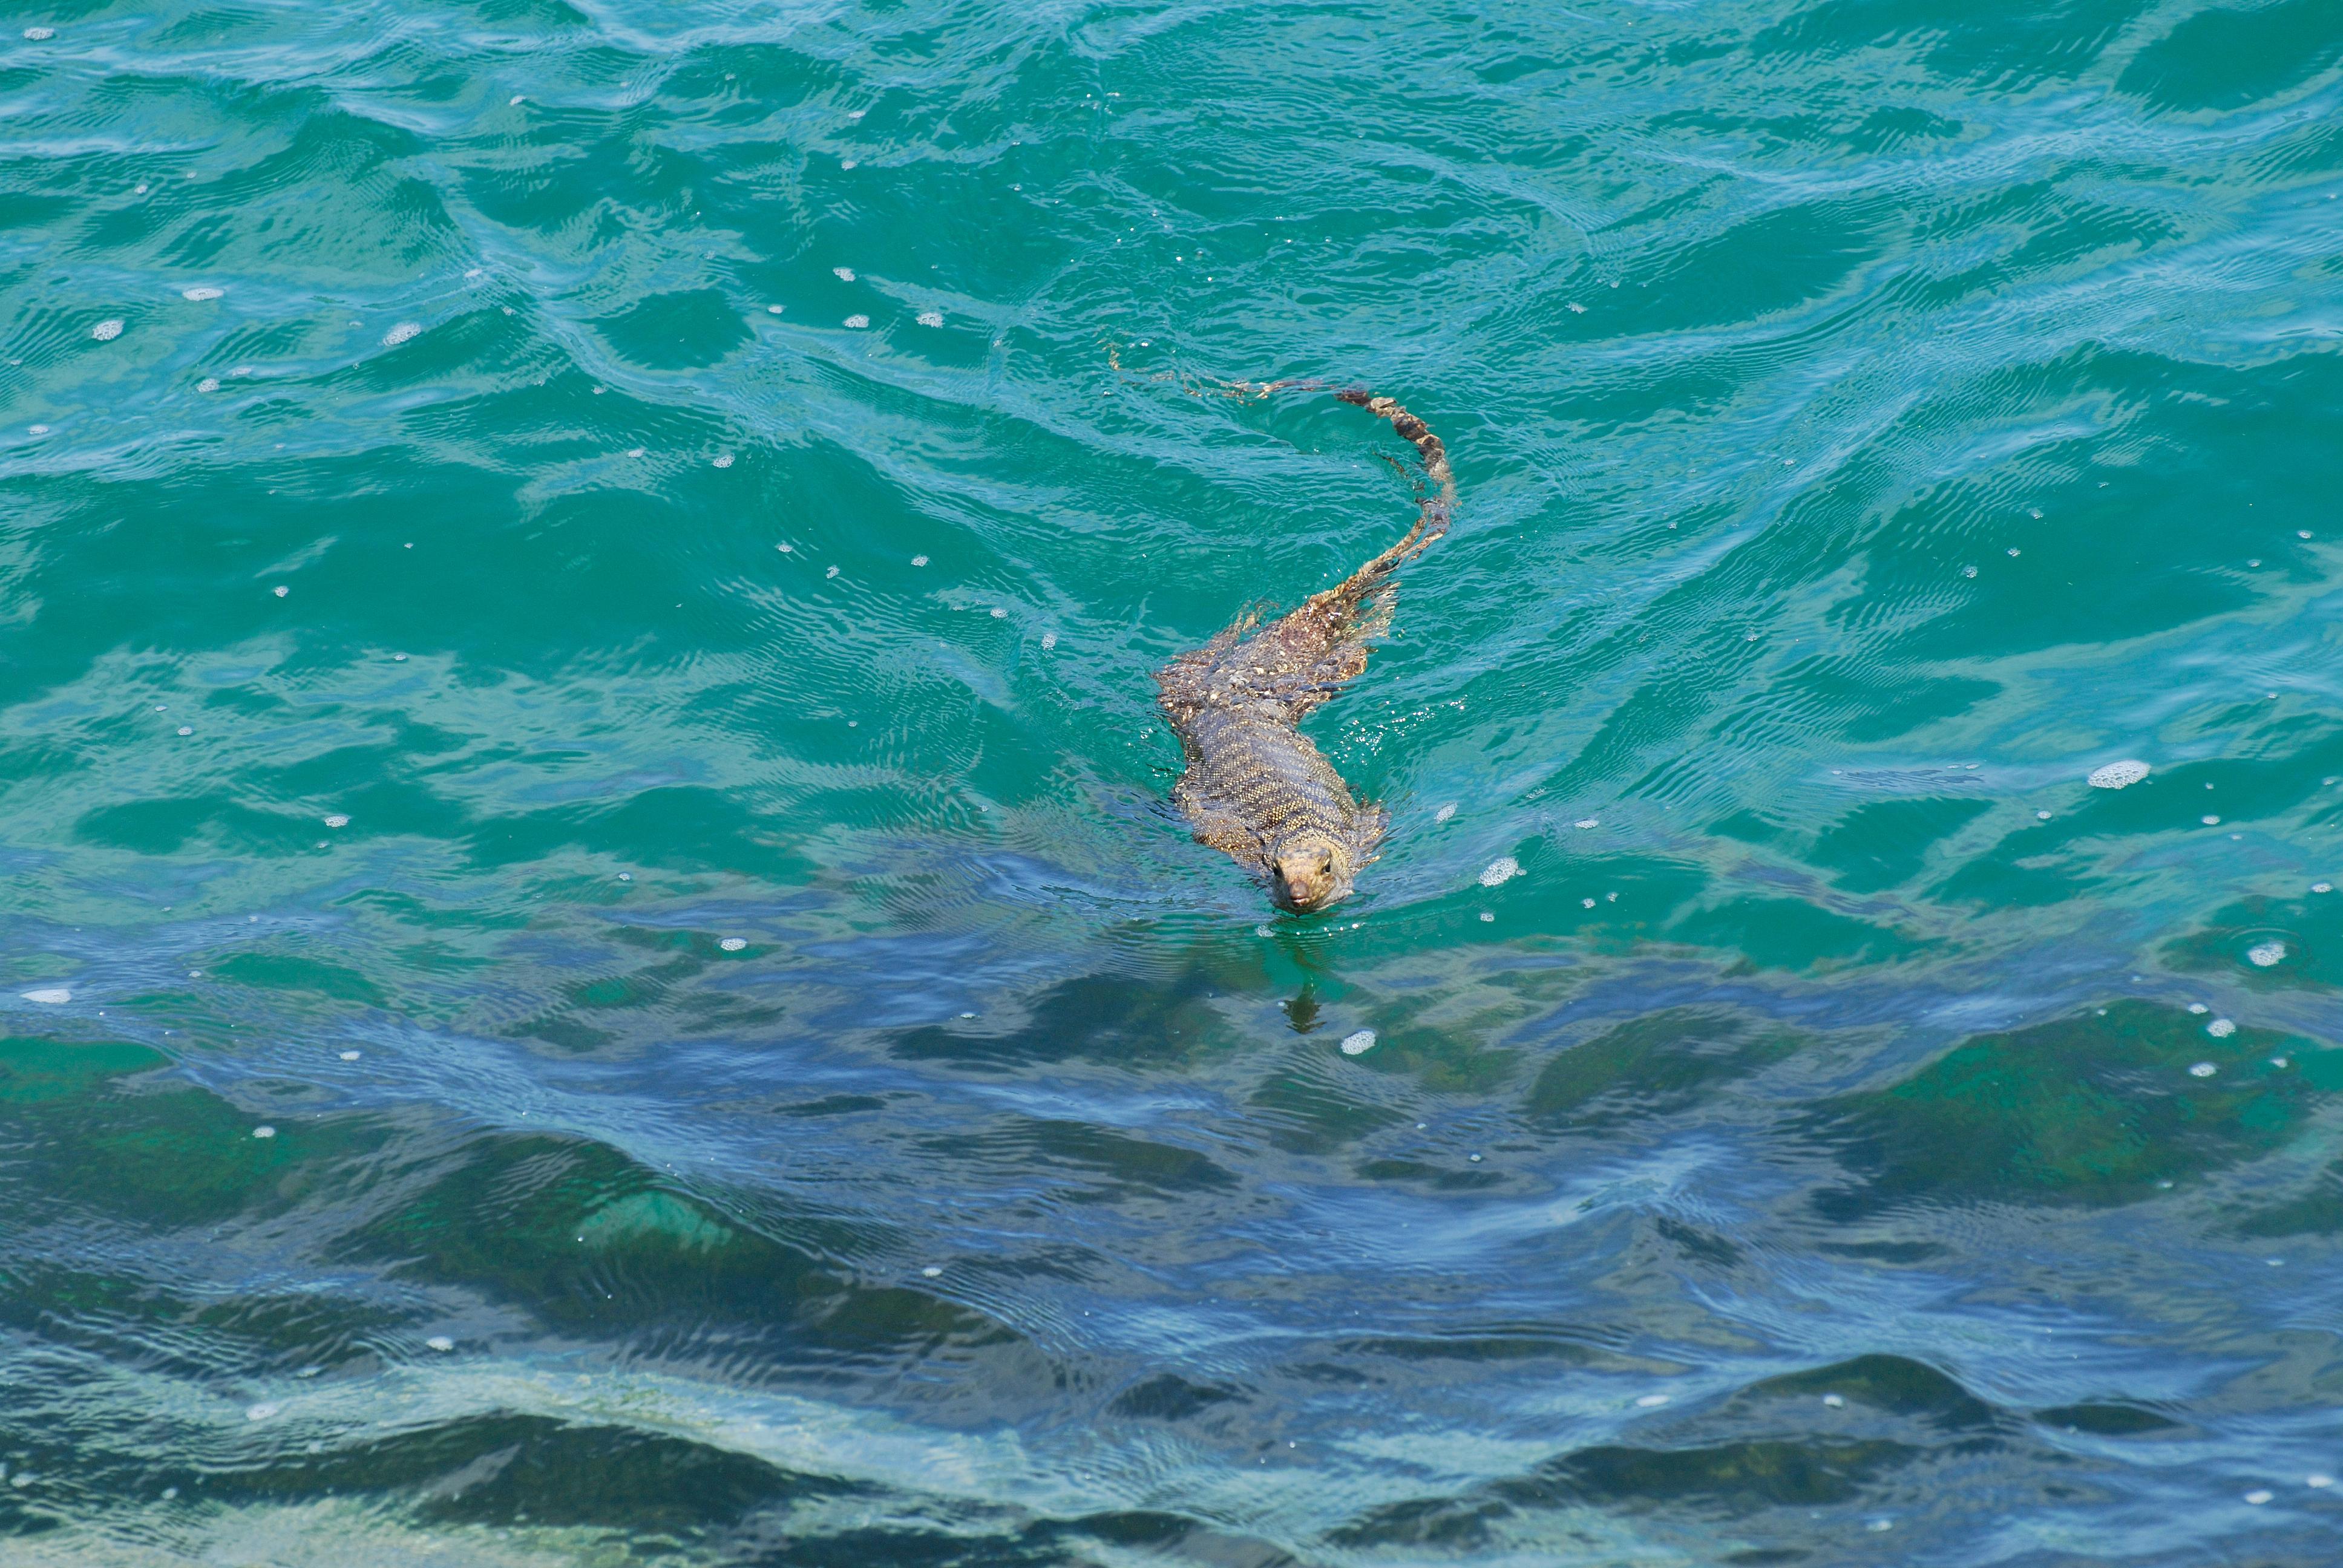 Look! It's a fish! No, it's an alligator! No, it's a... swimming giant lizard?!?!